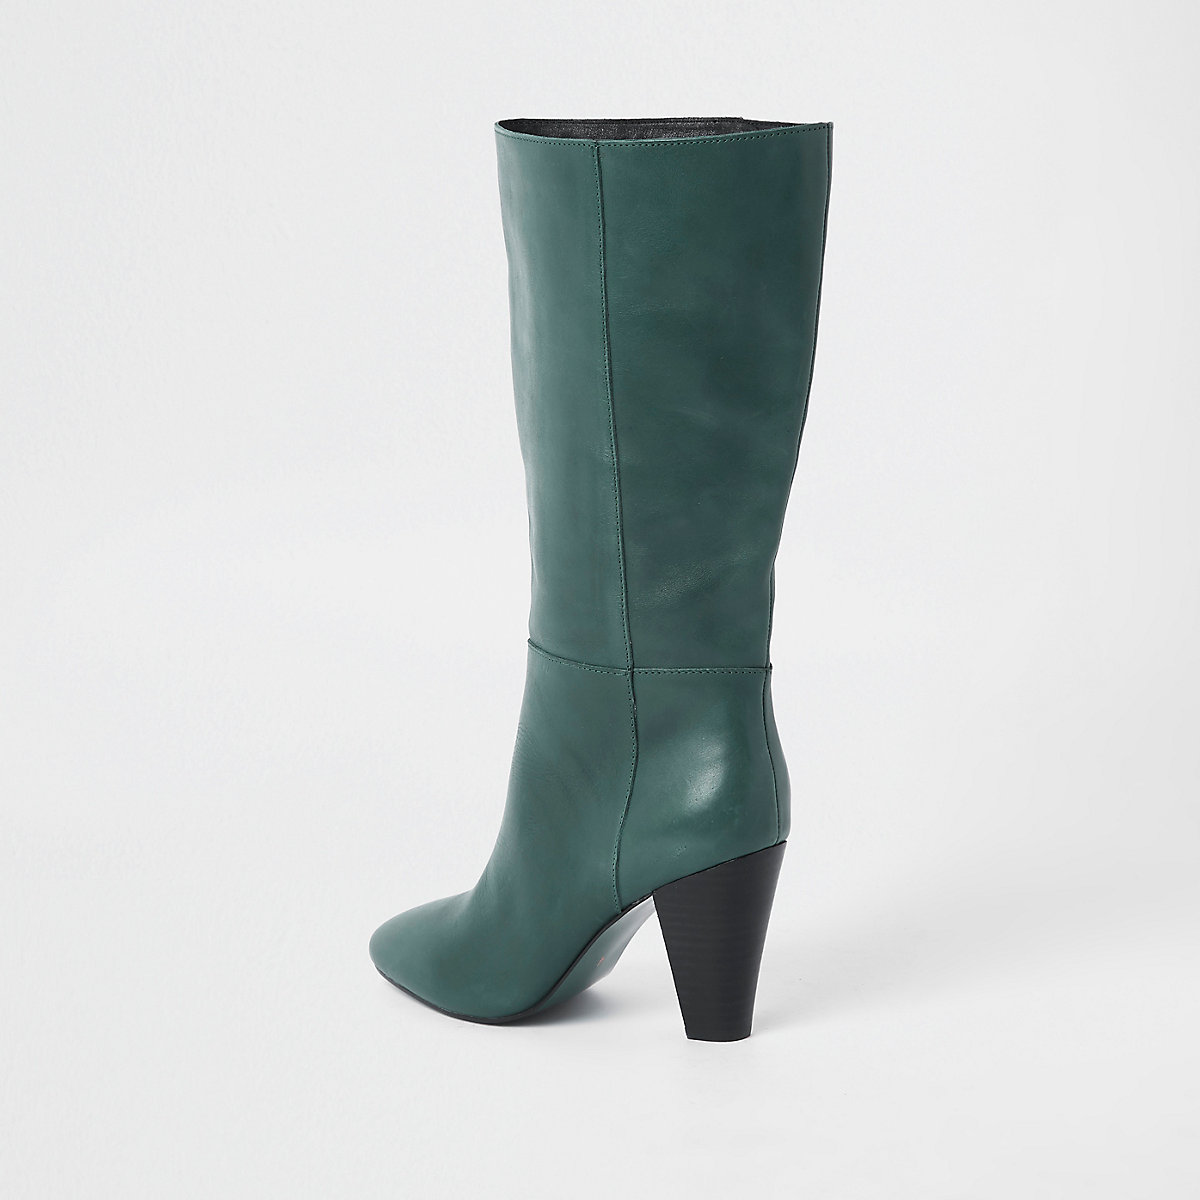 ... Groene leren kniehoge laarzen met blokhak ...